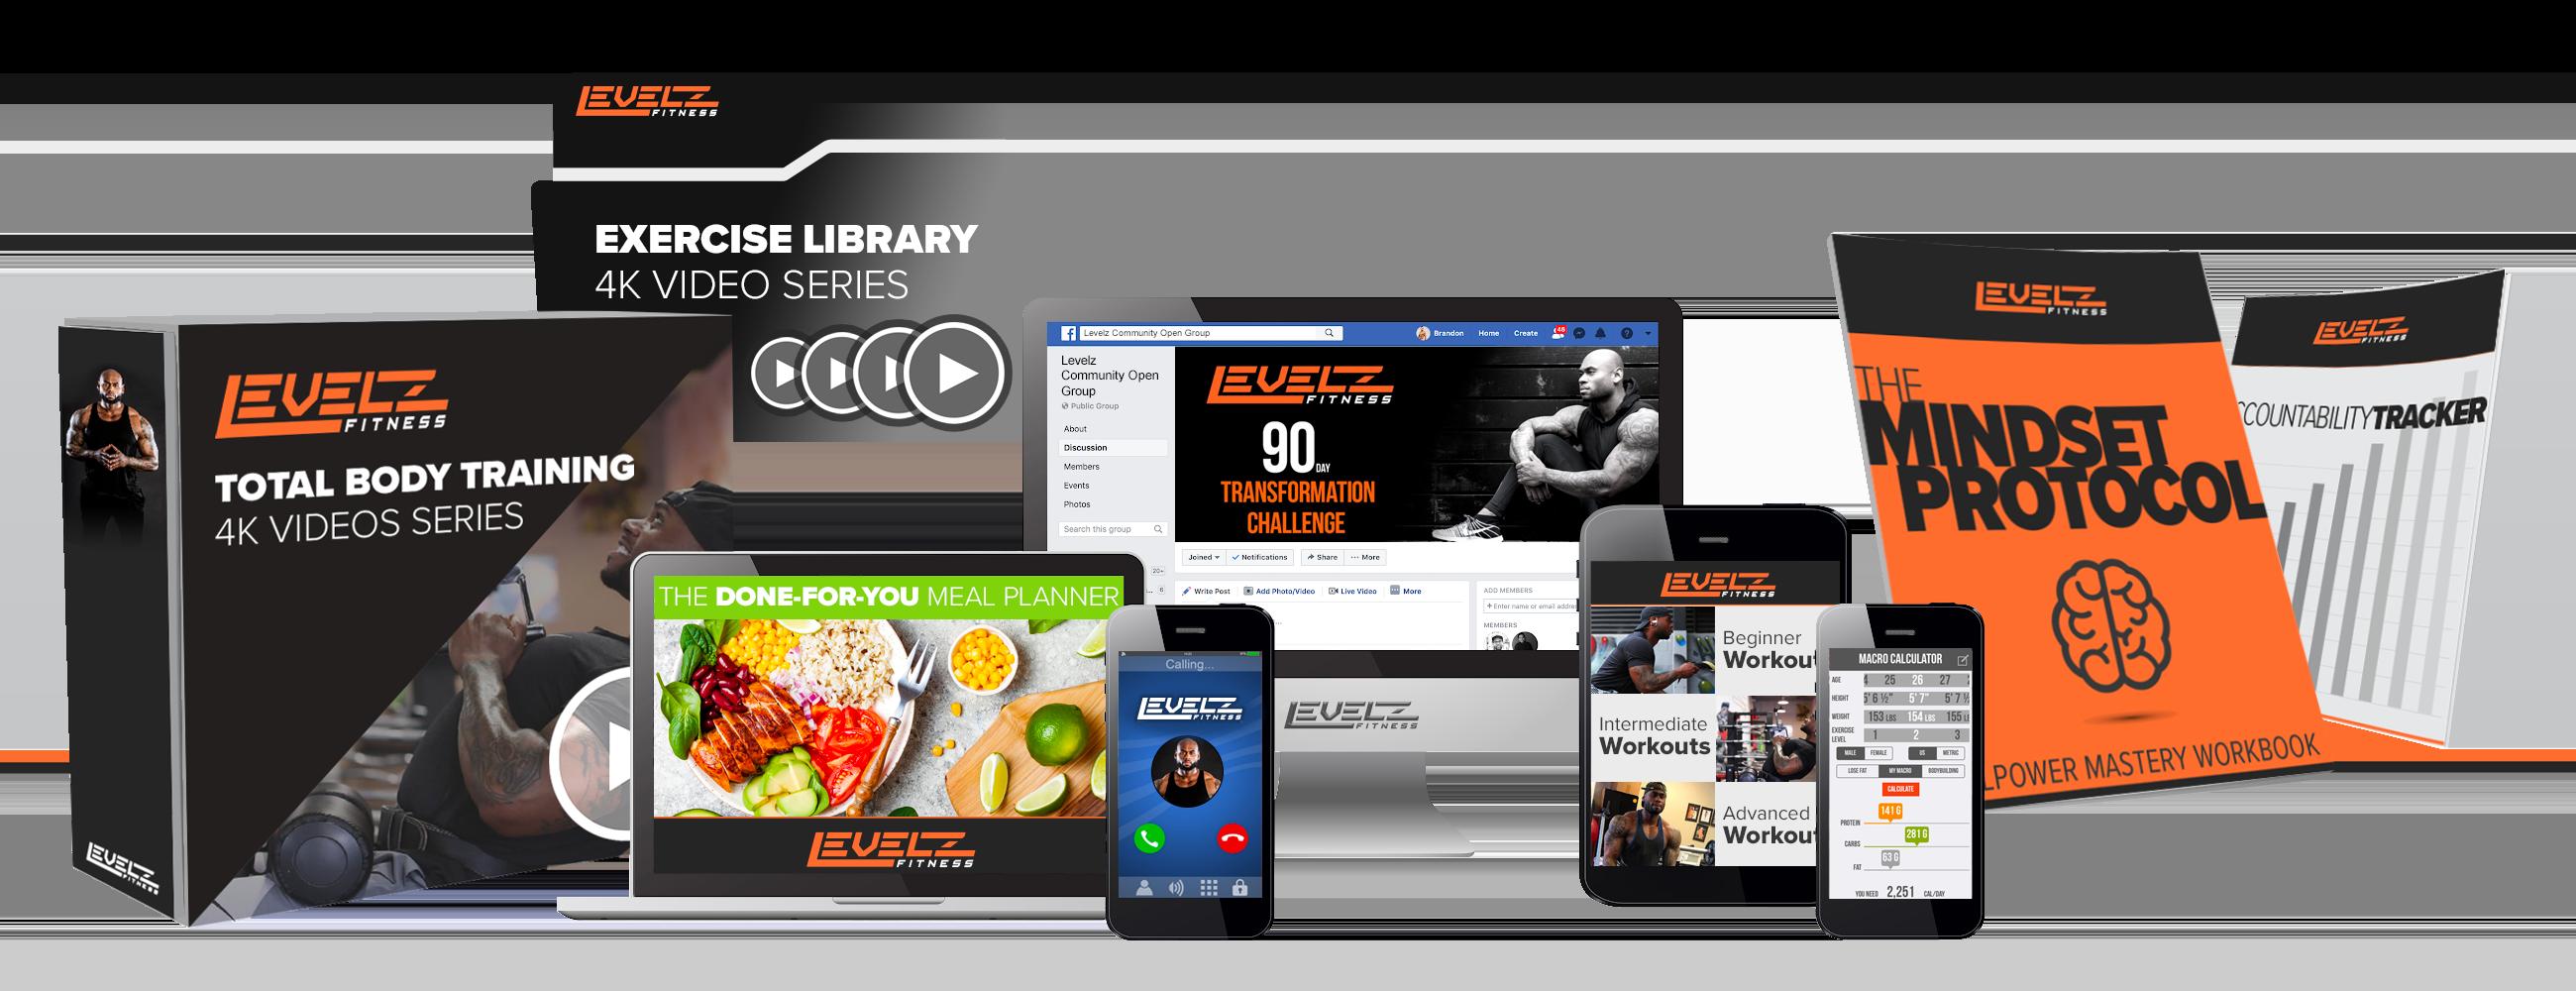 Corey Calliet Levelz Fitness 90 Day Program Contents